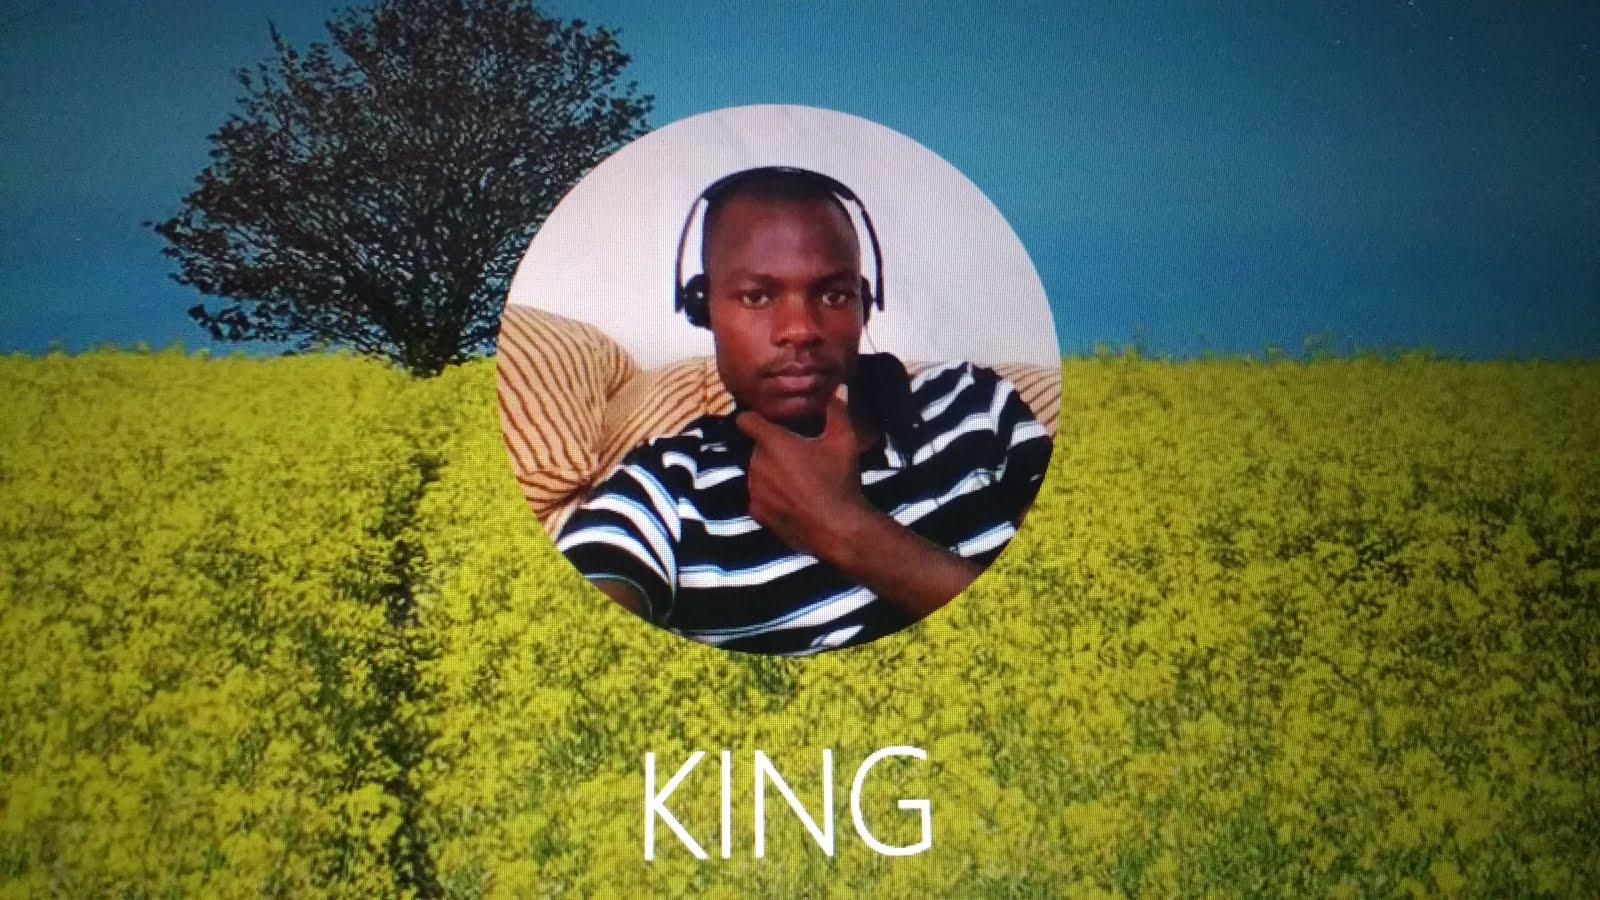 King Abung'ana